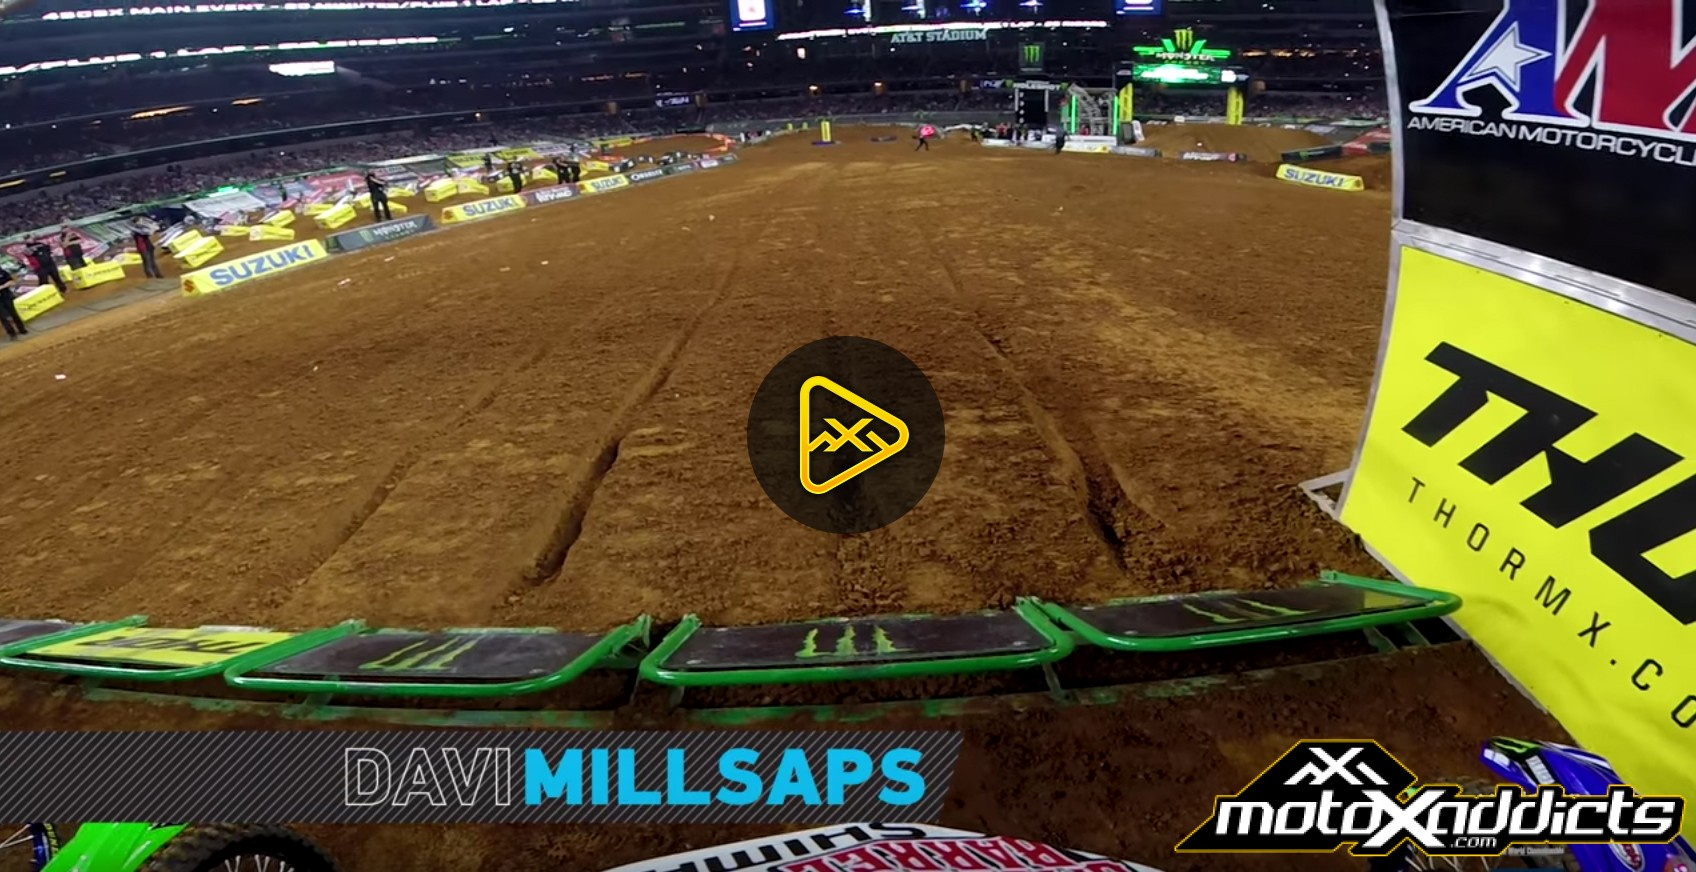 GoPro: Davi Millsaps at 2017 Arlington SX